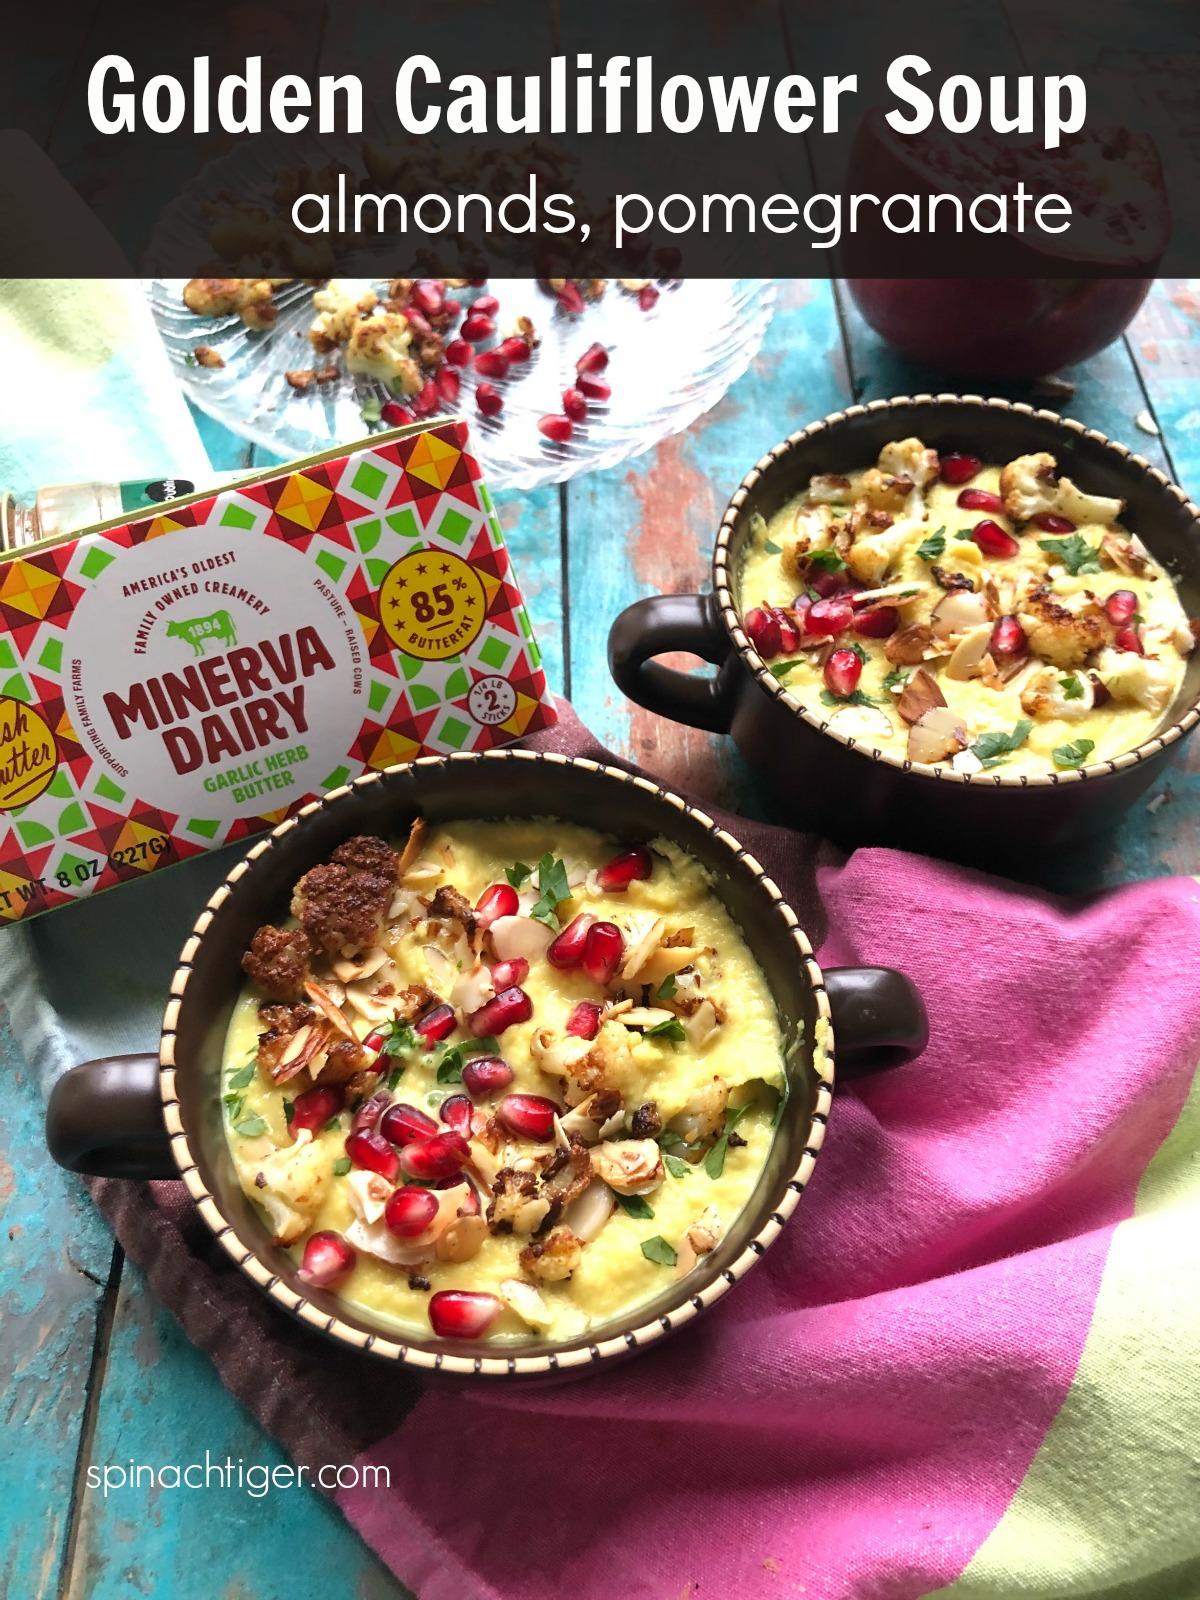 Golden Cauliflower Soup with Turmeric, Almonds, Pomegrnanate